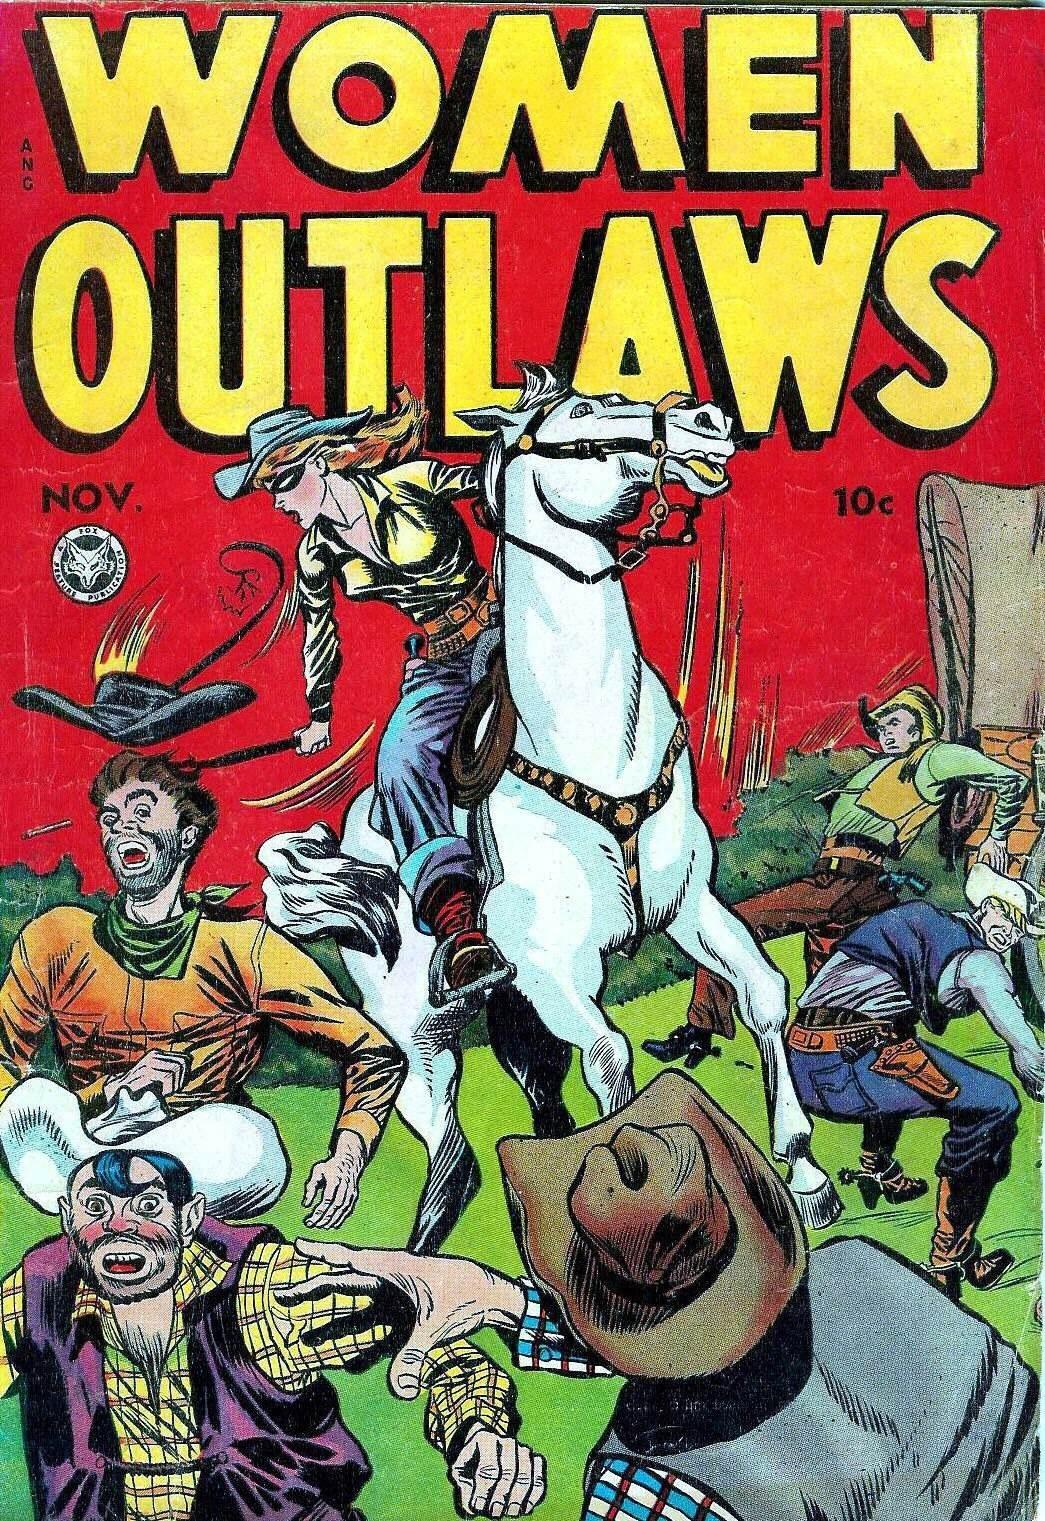 How Censors Killed The Weird, Experimental, Progressive Golden Age Of Comics